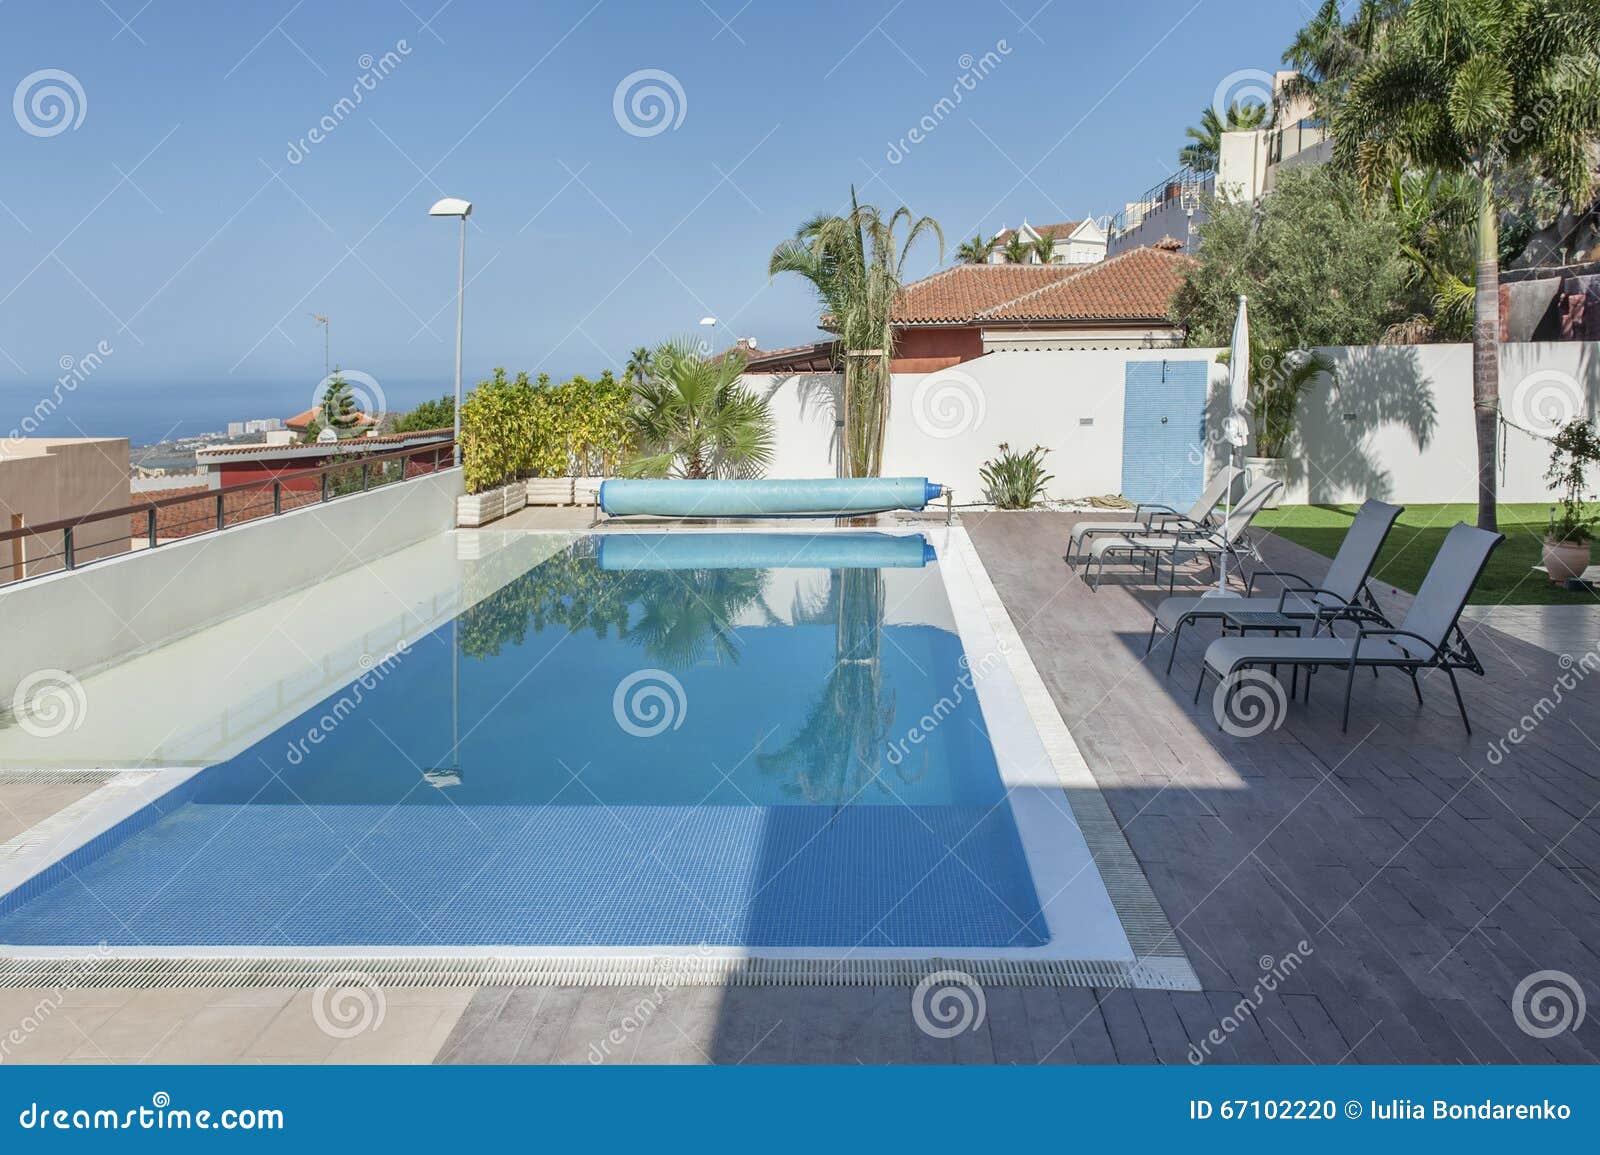 Luxury white villa with swimming pool